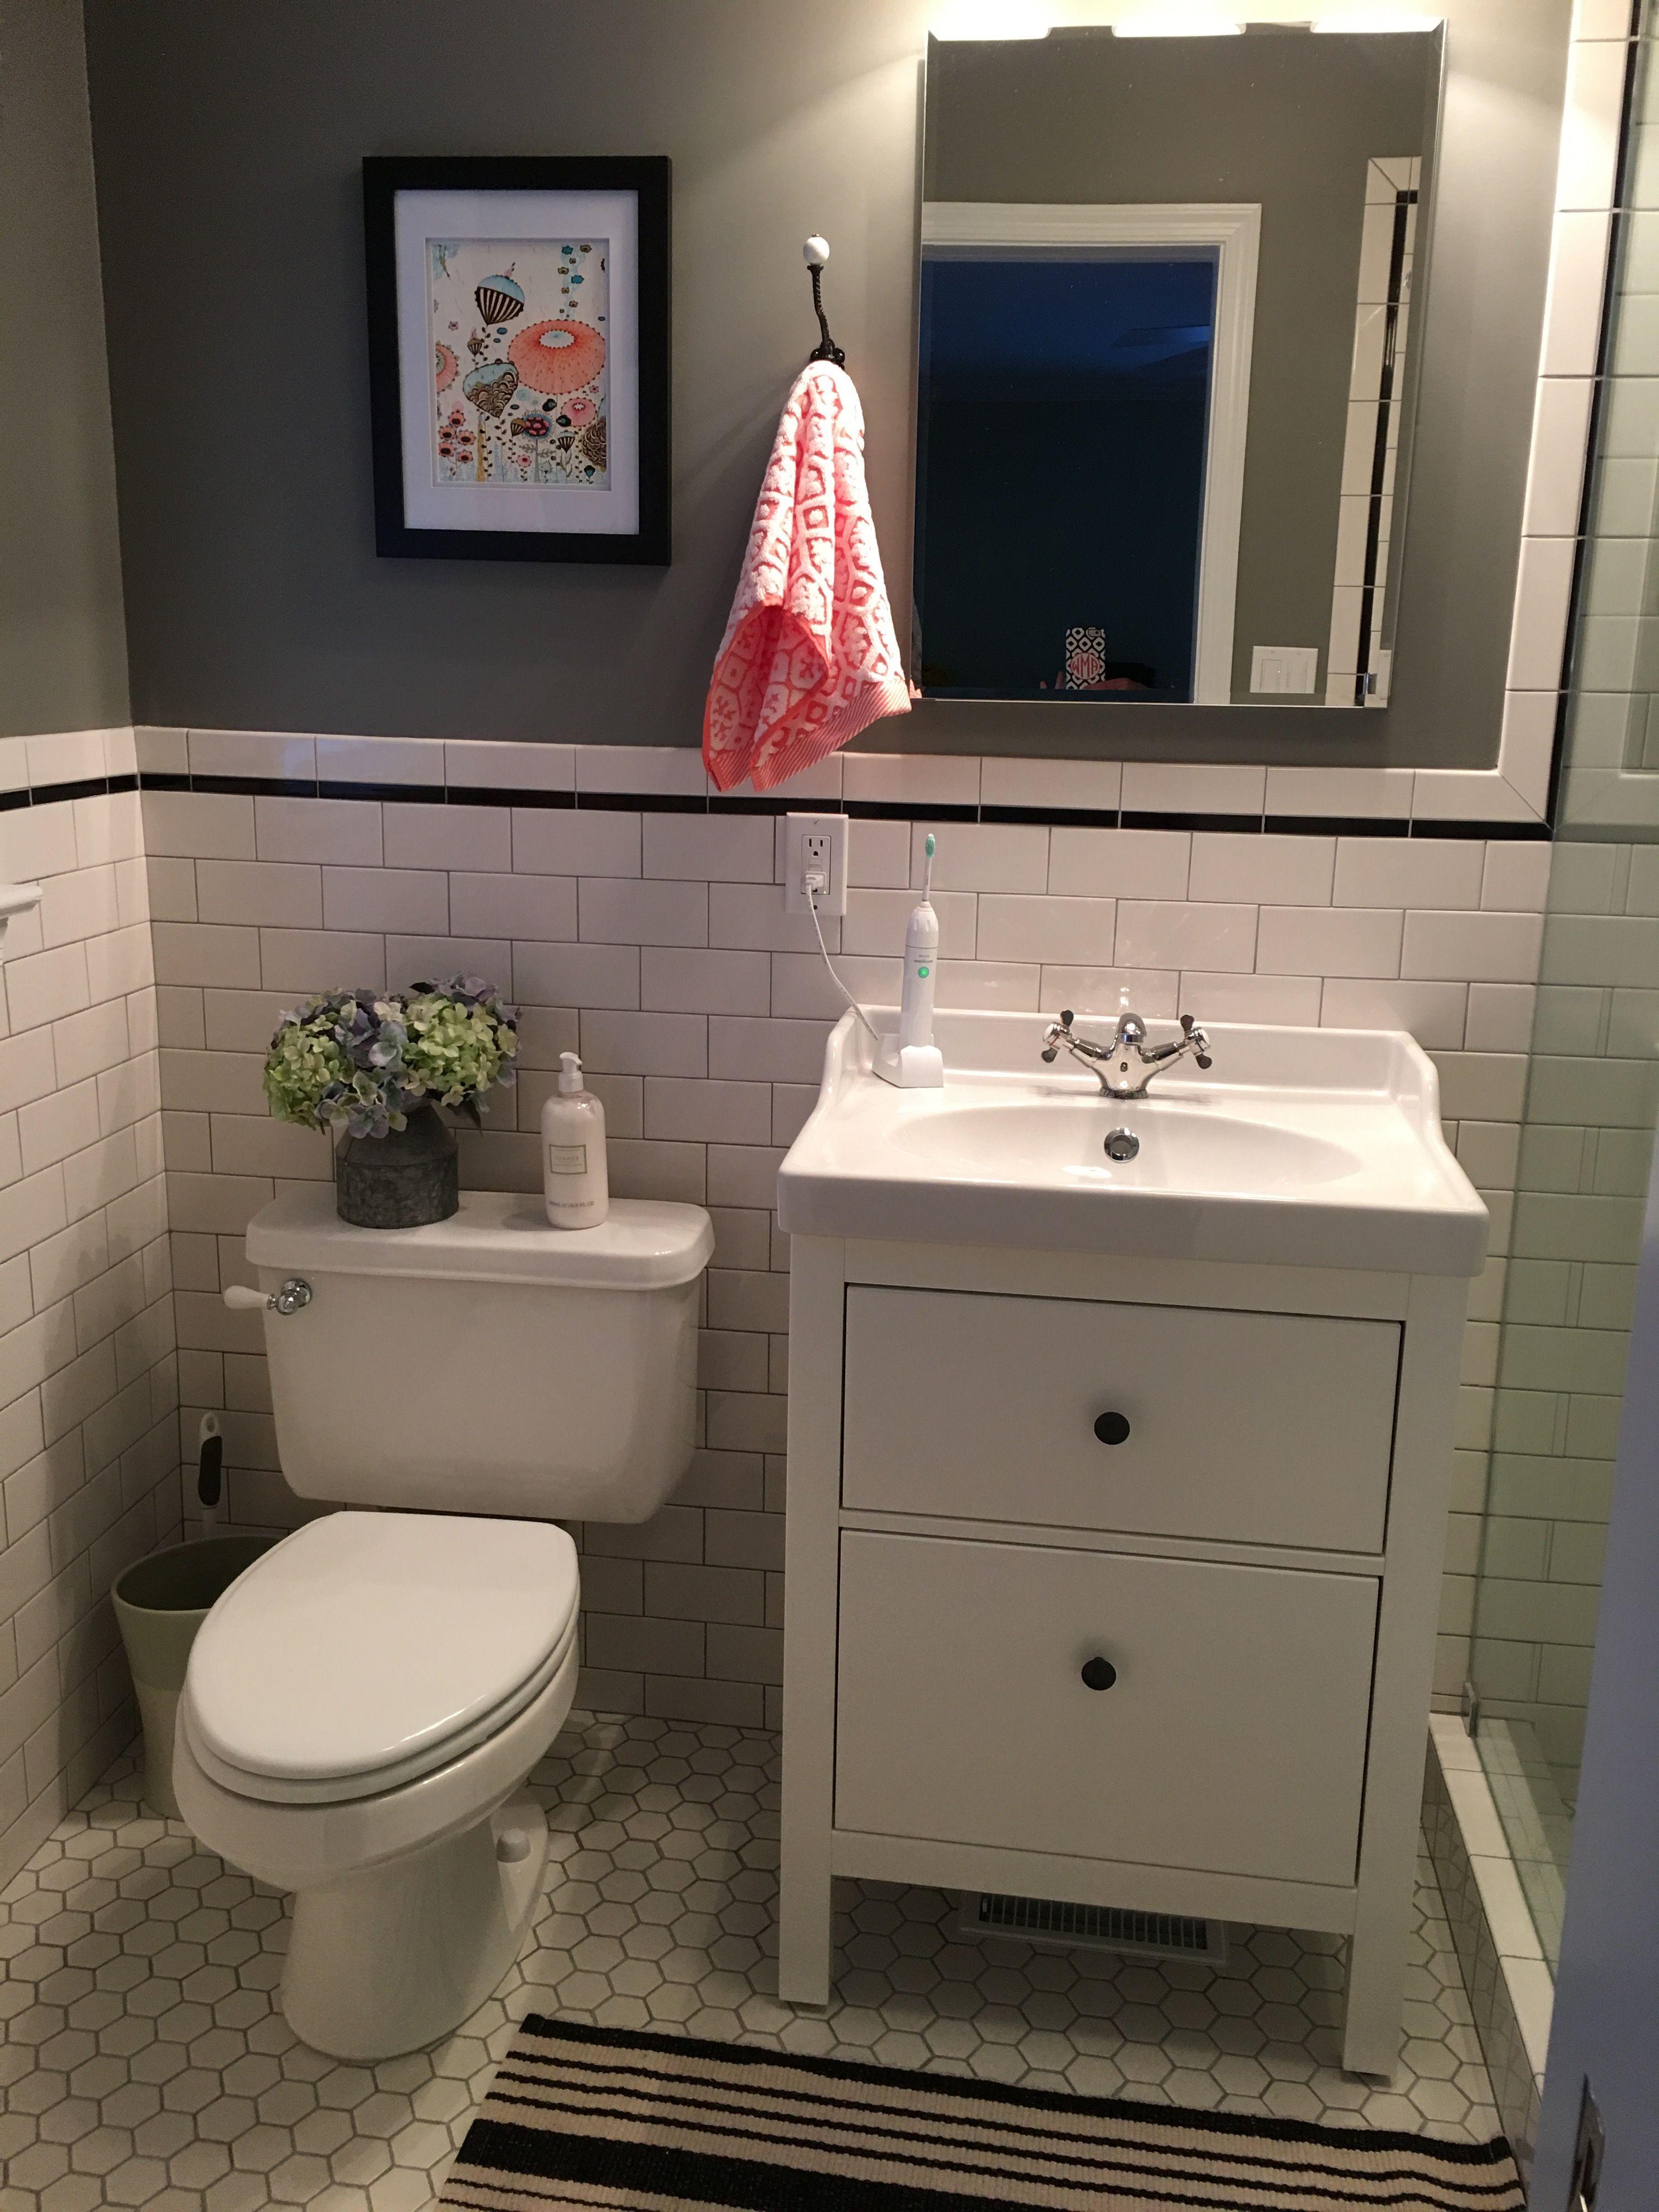 ikea hemnes bathroom vanity bathroom remodel pinterest on ikea bathroom vanities id=68211